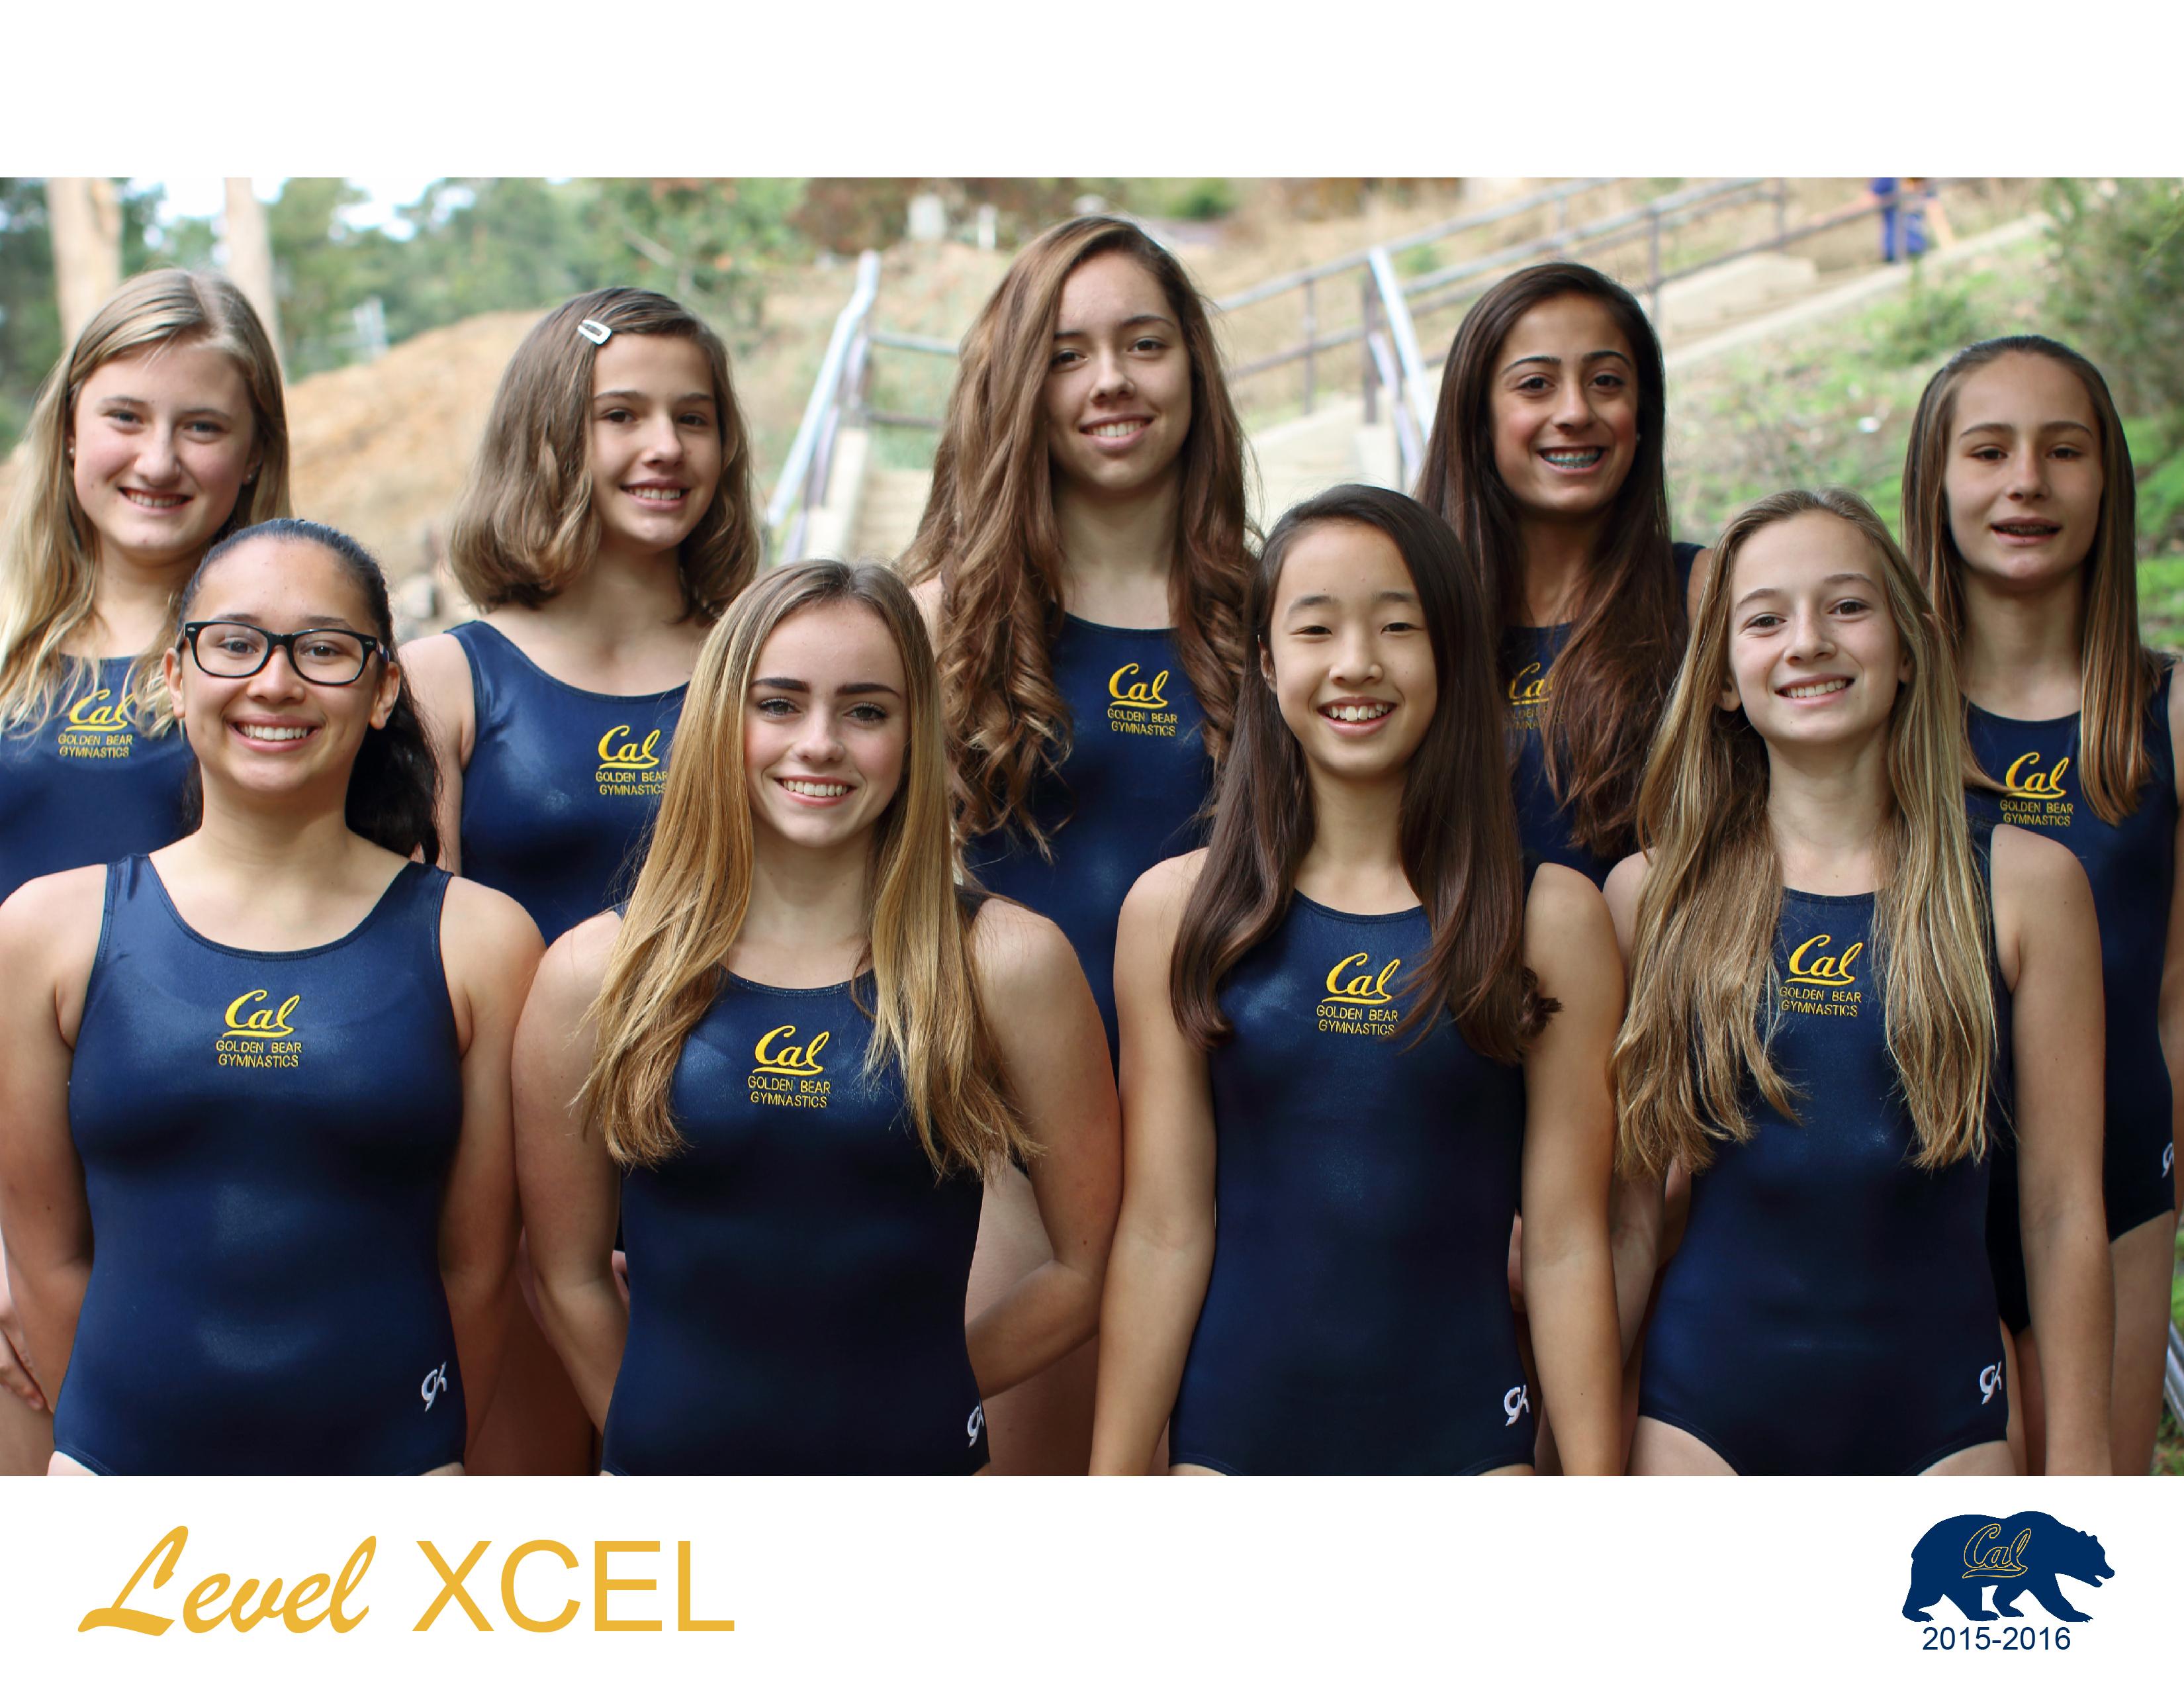 Team Level XCEL